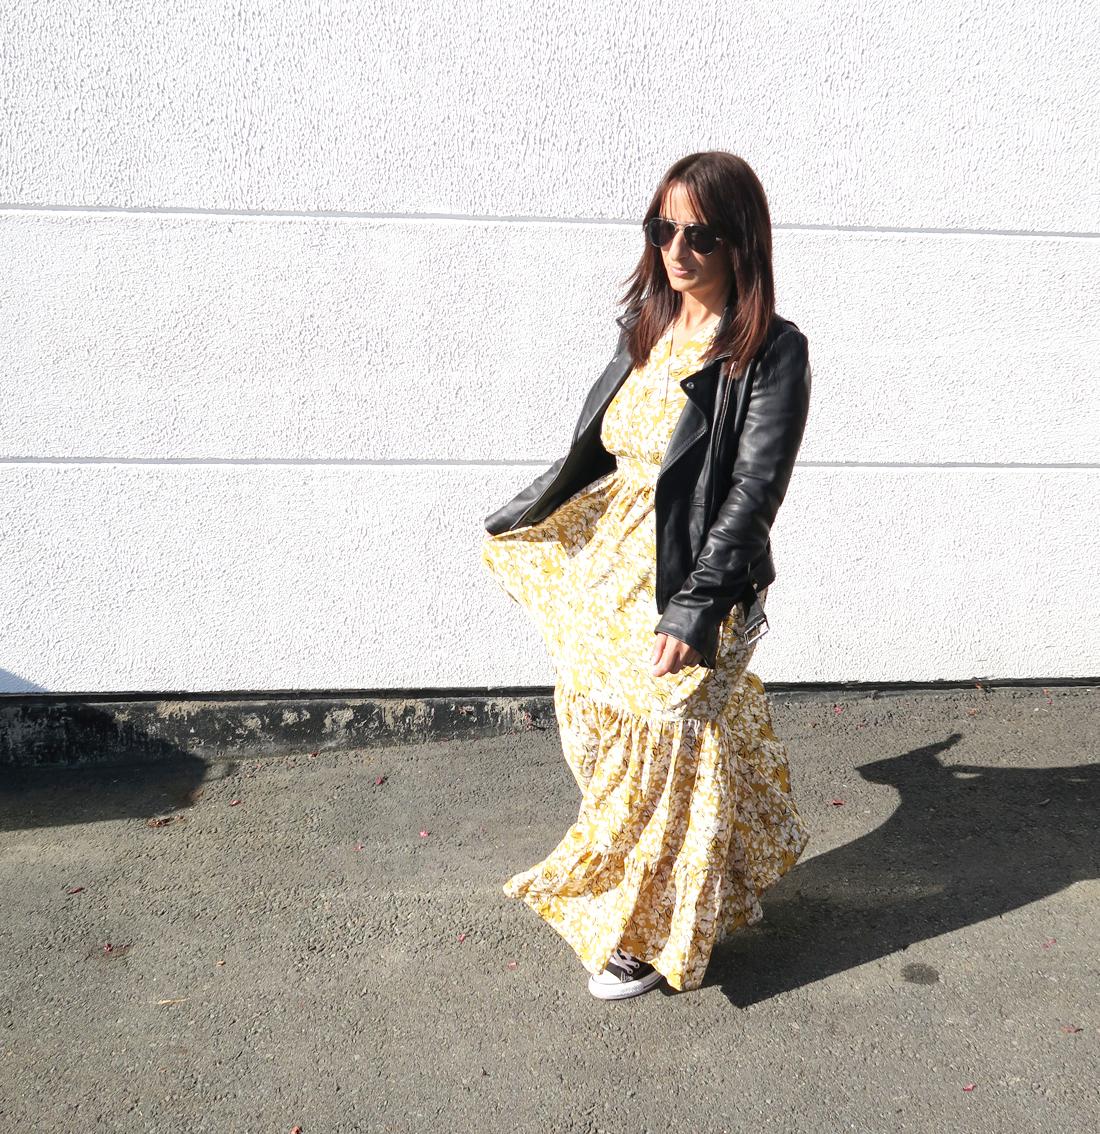 dressfo-kleid-modeblogger-fashionblogger-blogger-style-fashion-modesalat-streetstyle-8